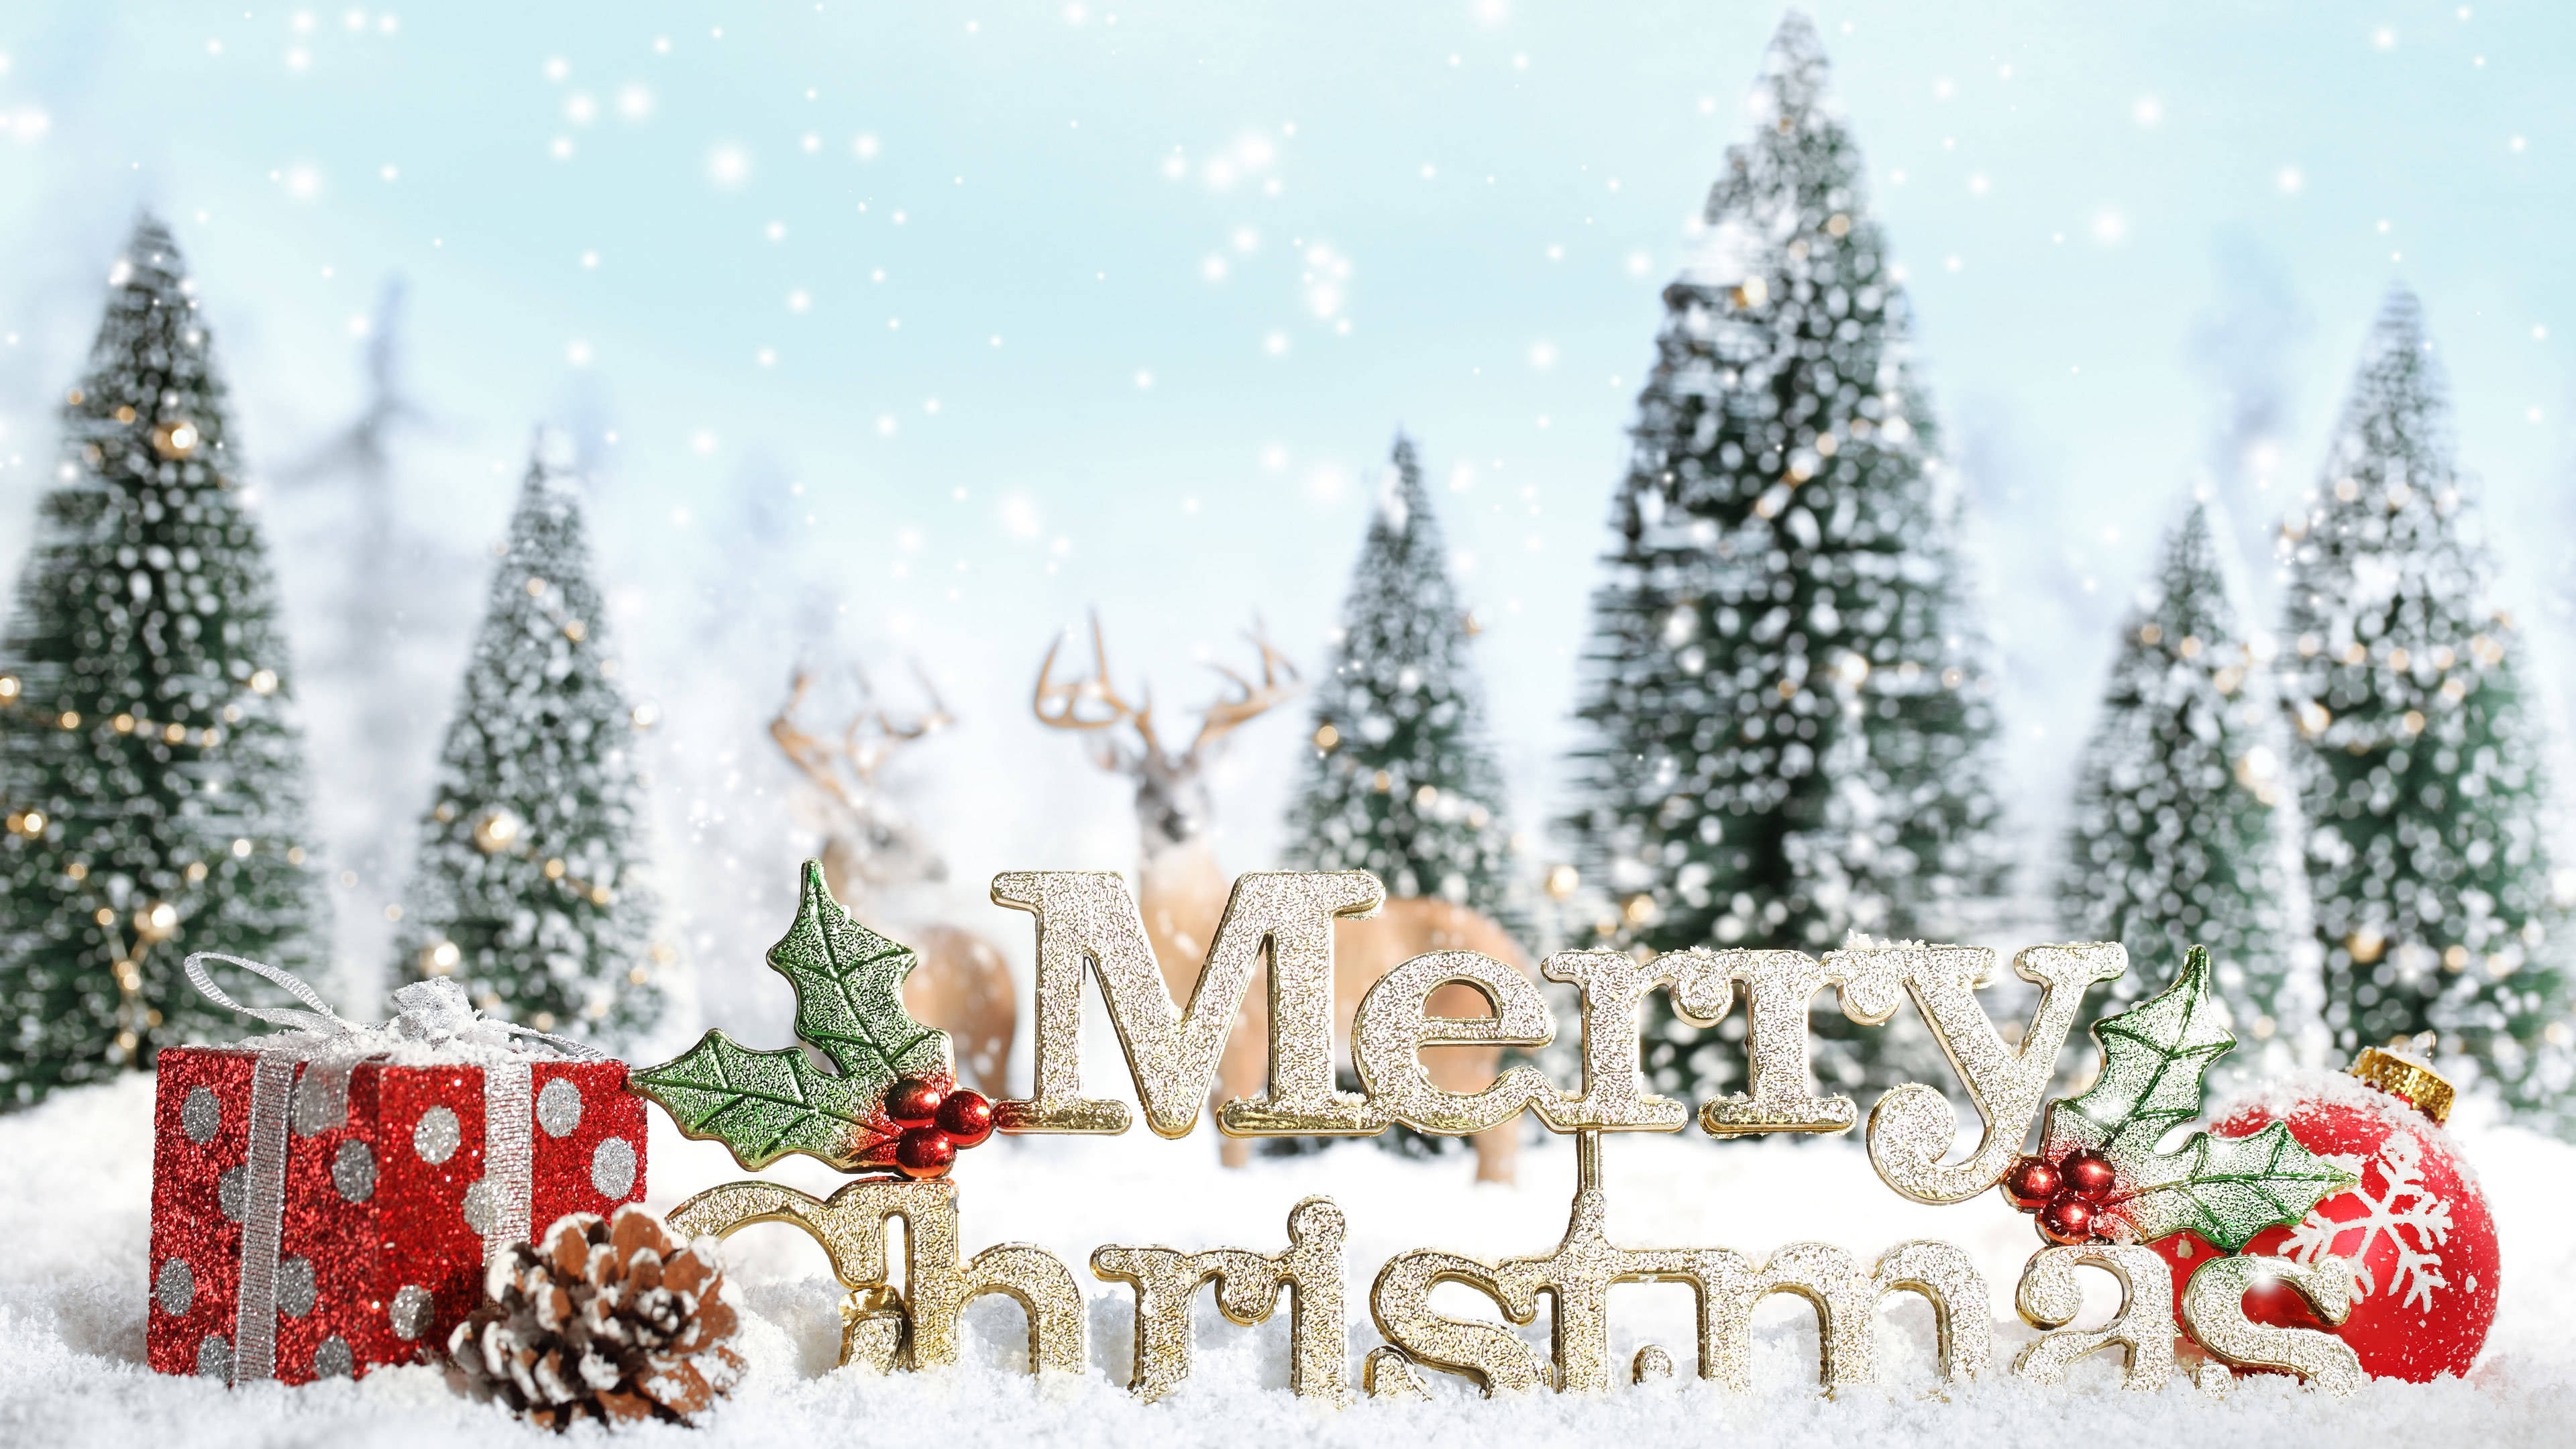 merry christmas text uhd 4k wallpaper